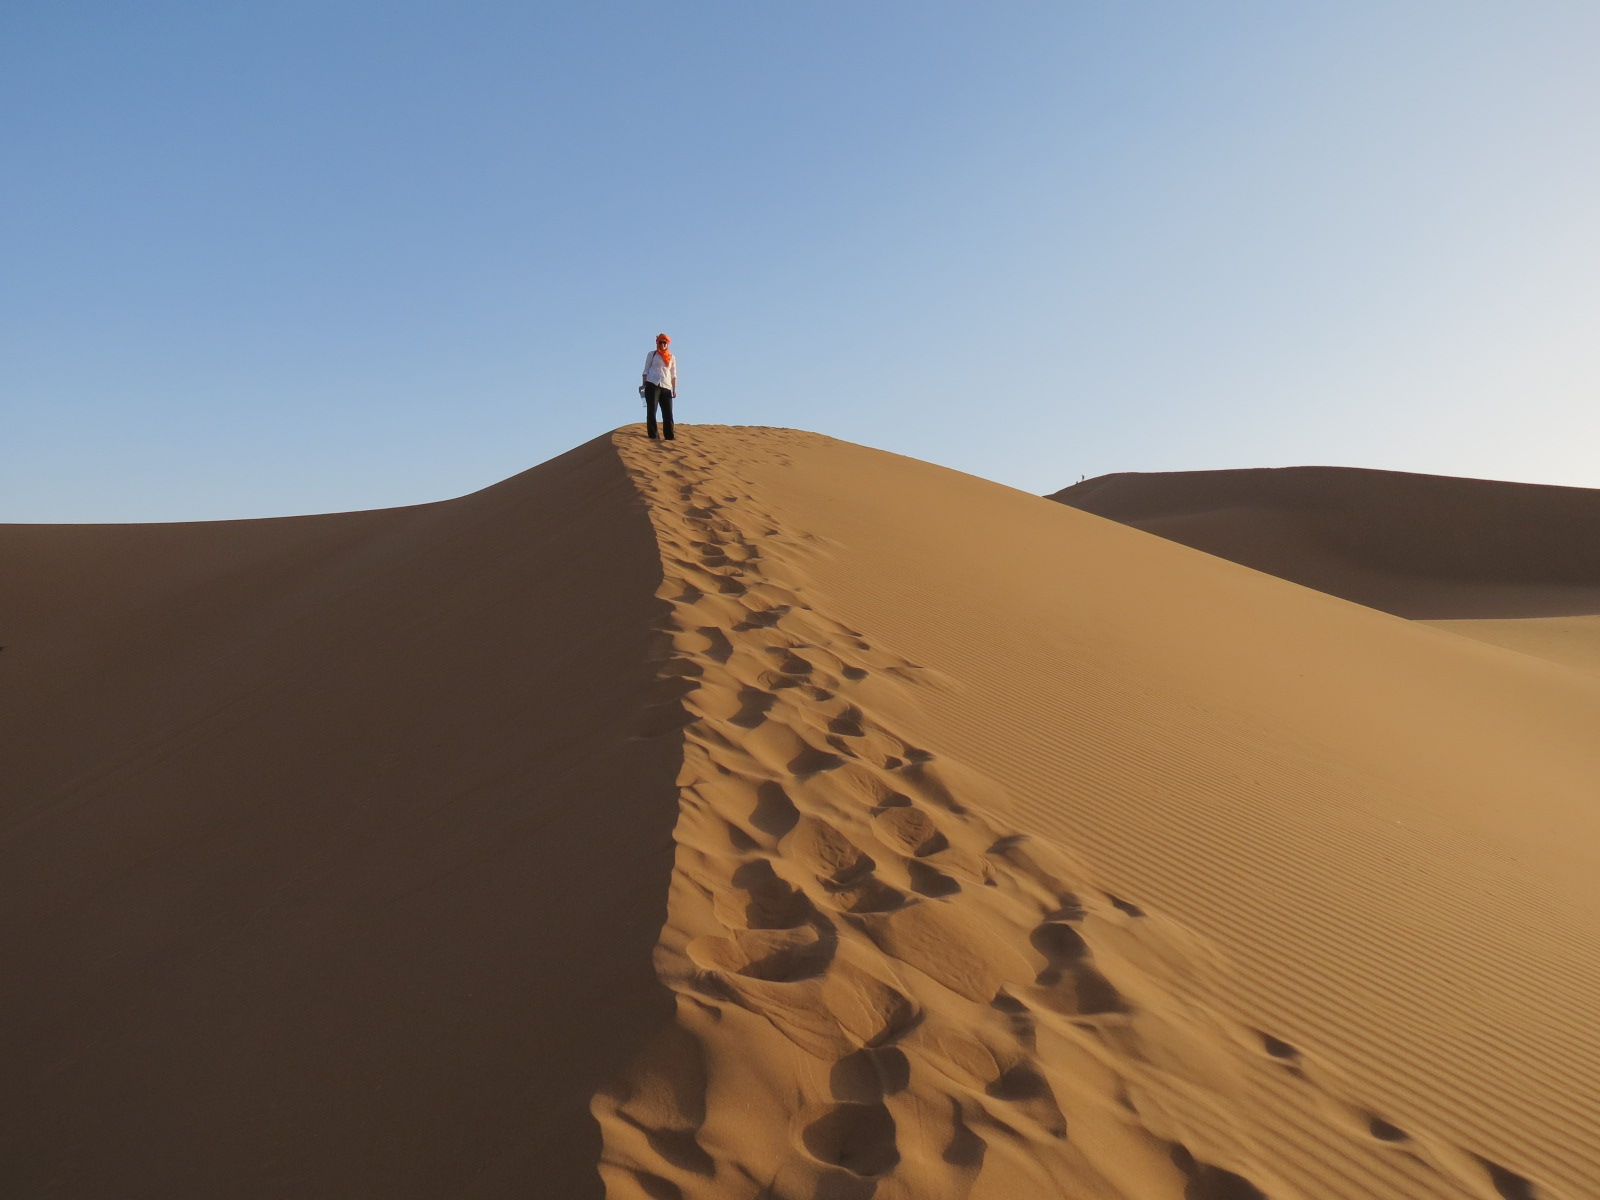 Climbing the magnificent dunes of the Sahara bare foot